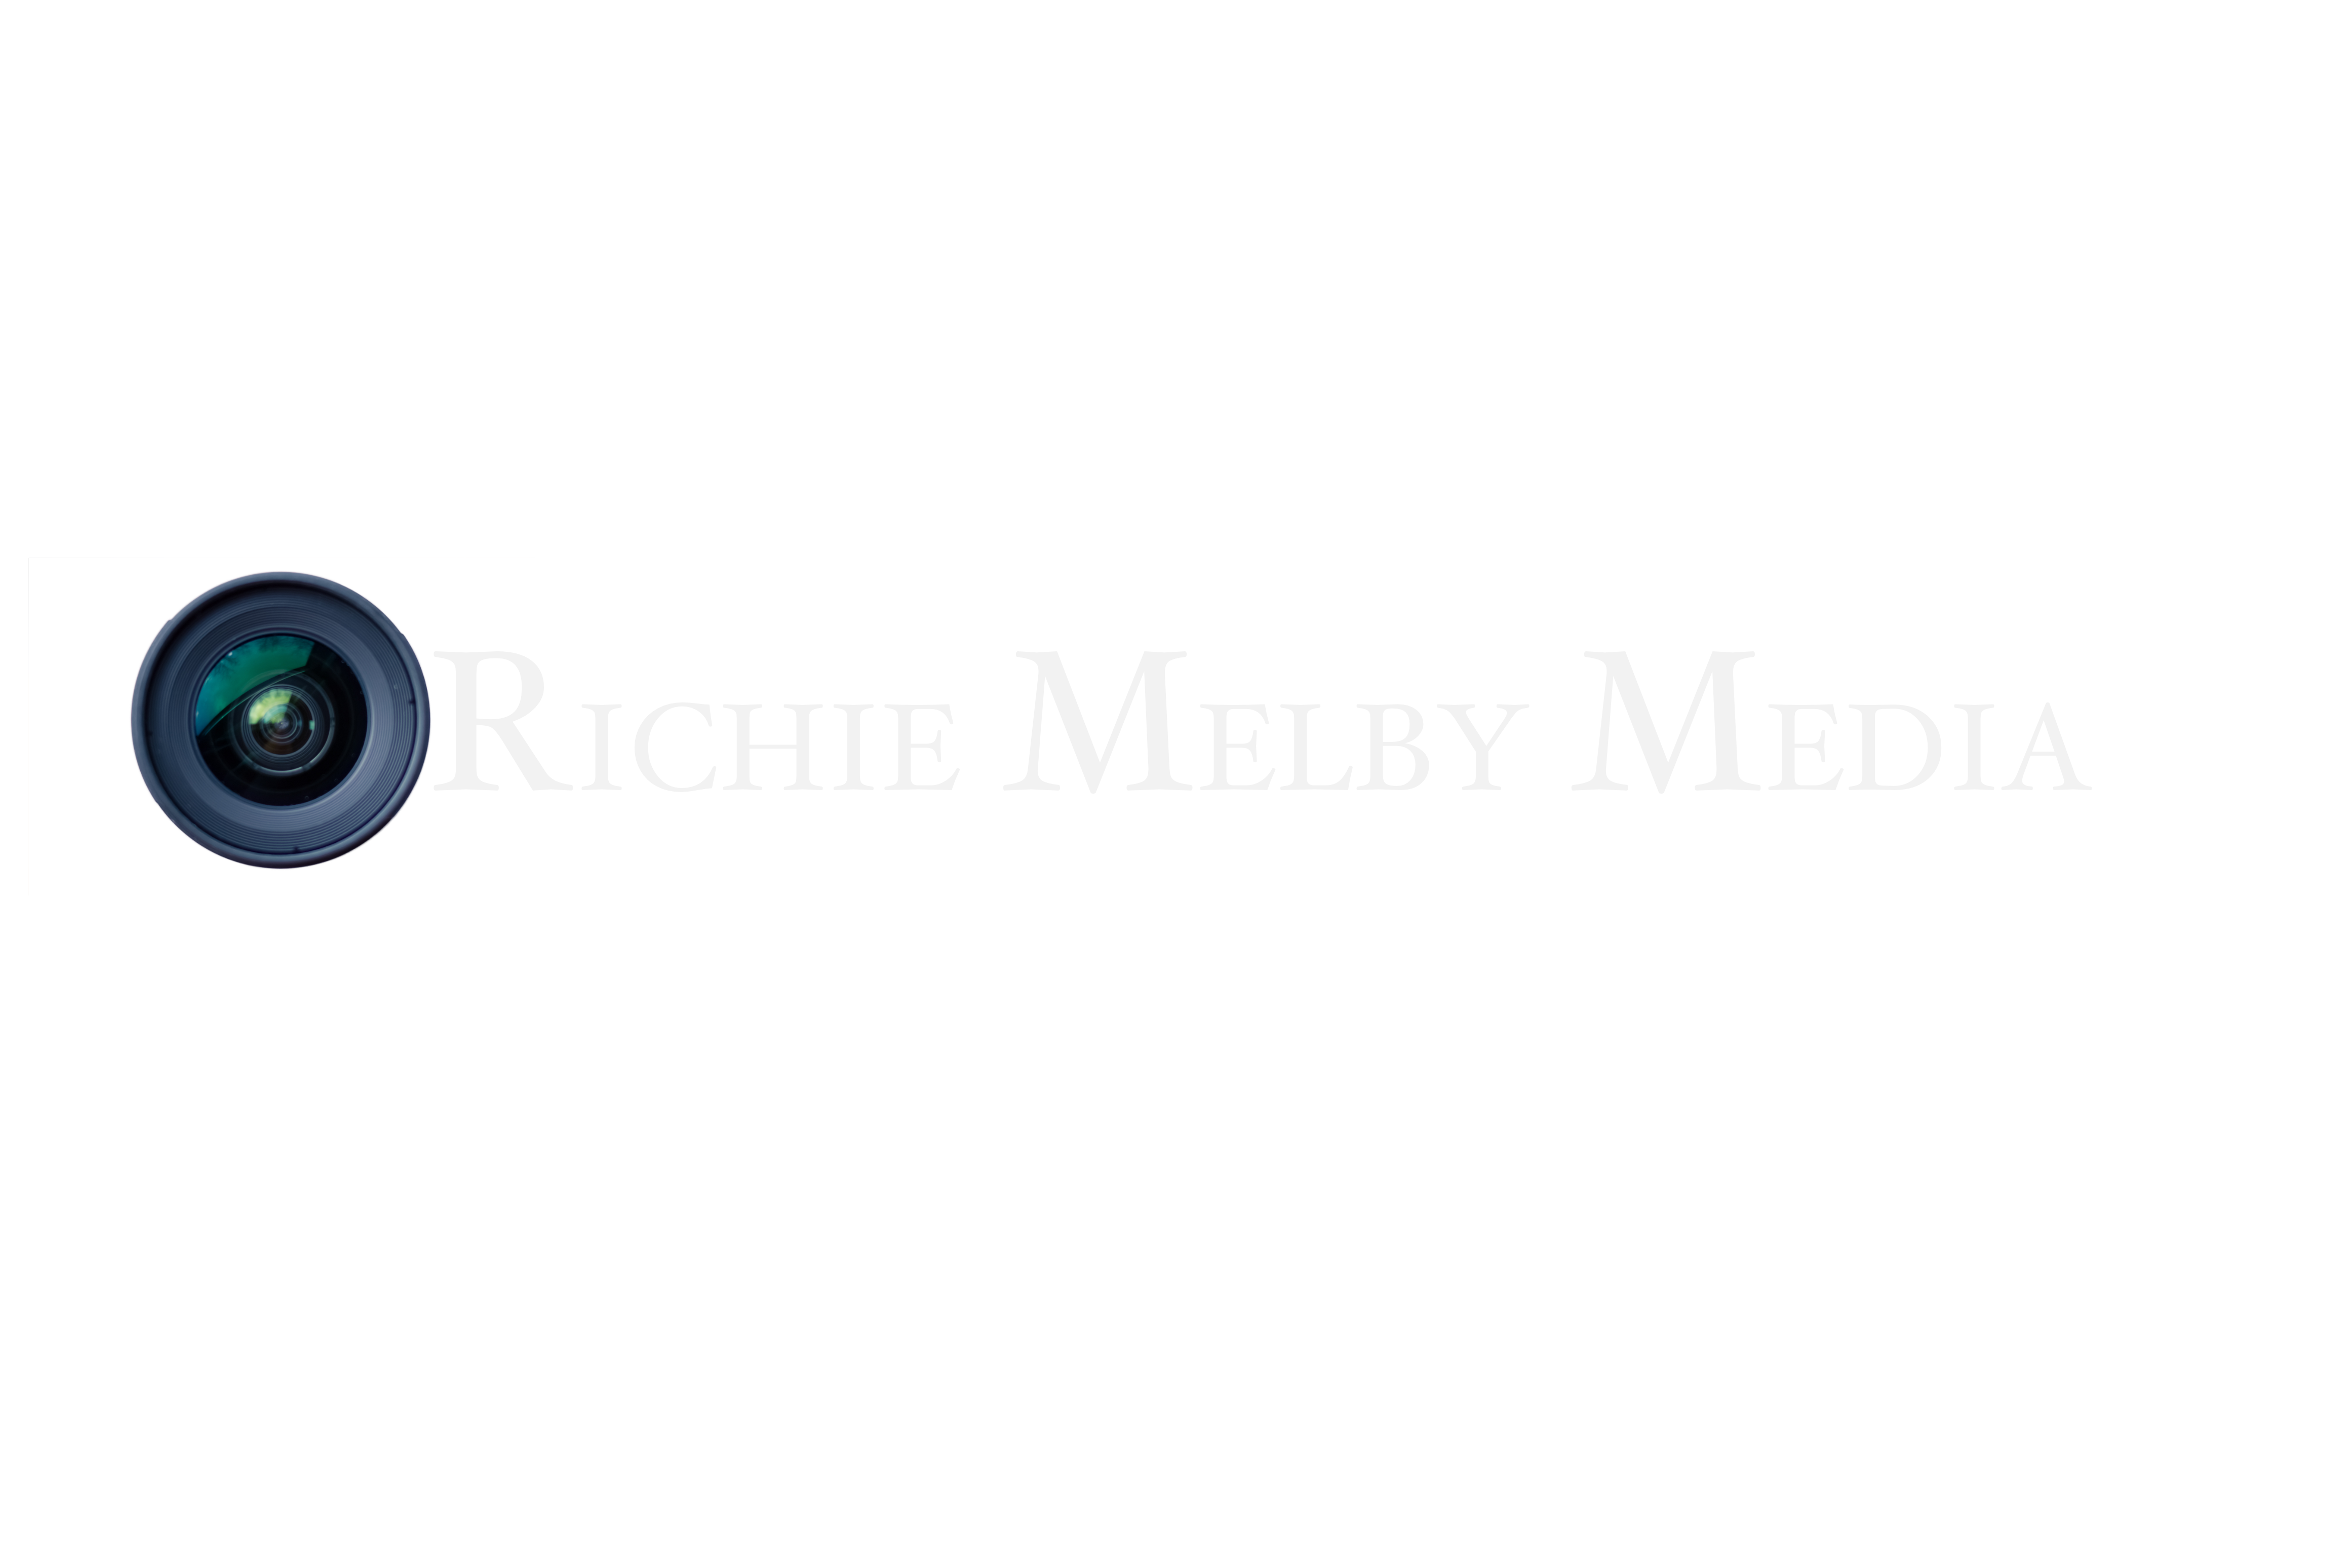 Richie Melby Media